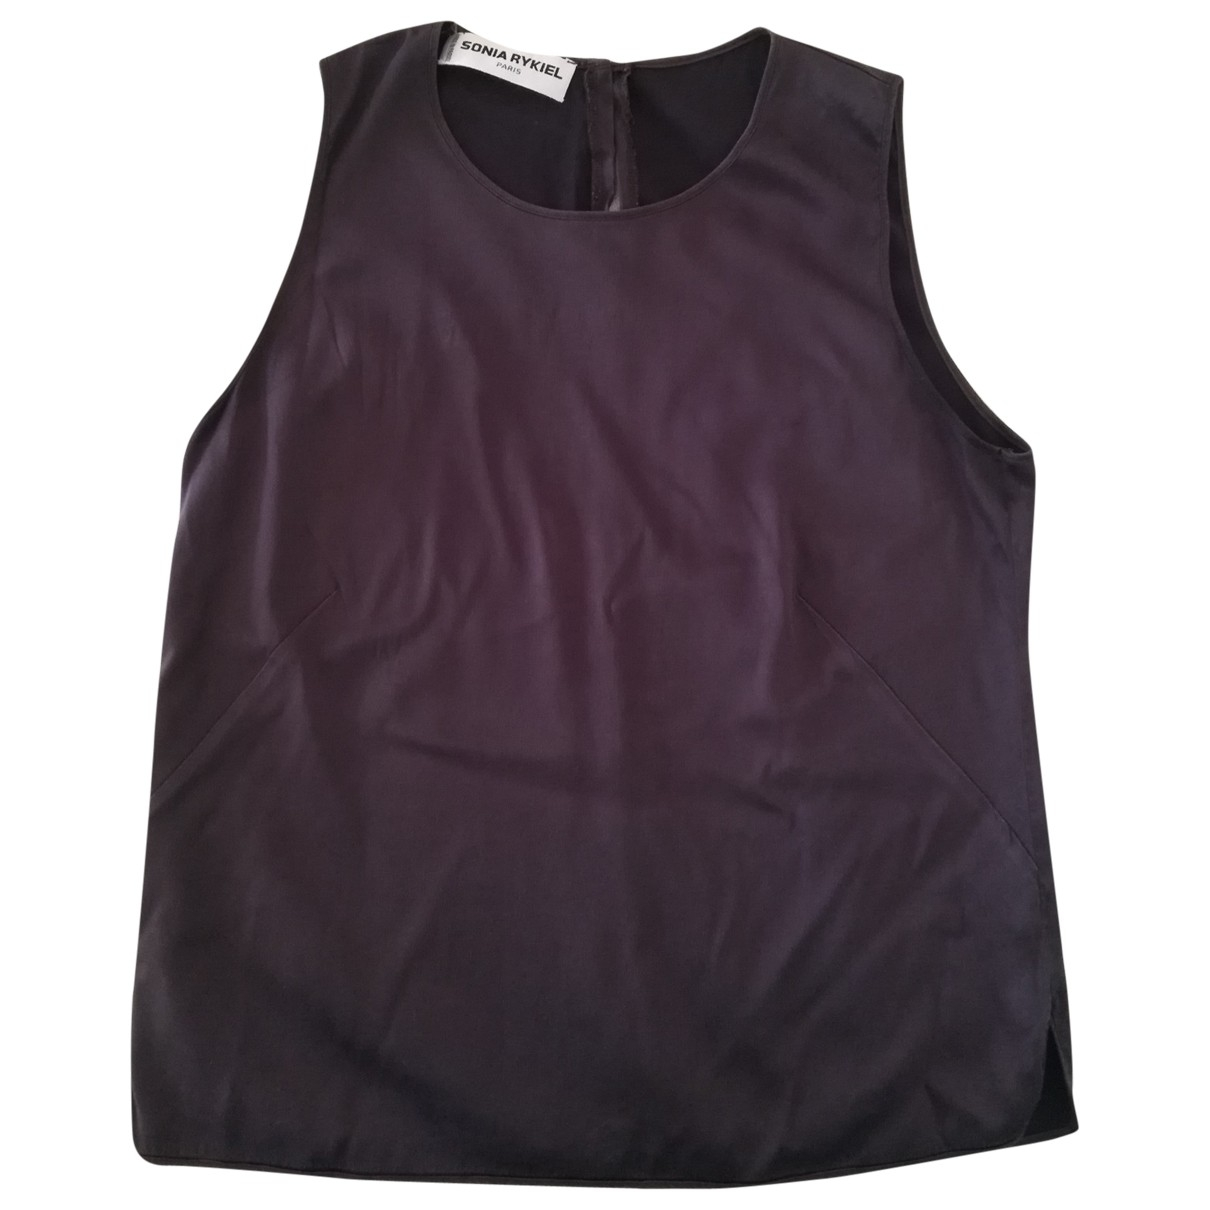 Sonia Rykiel - Top   pour femme en soie